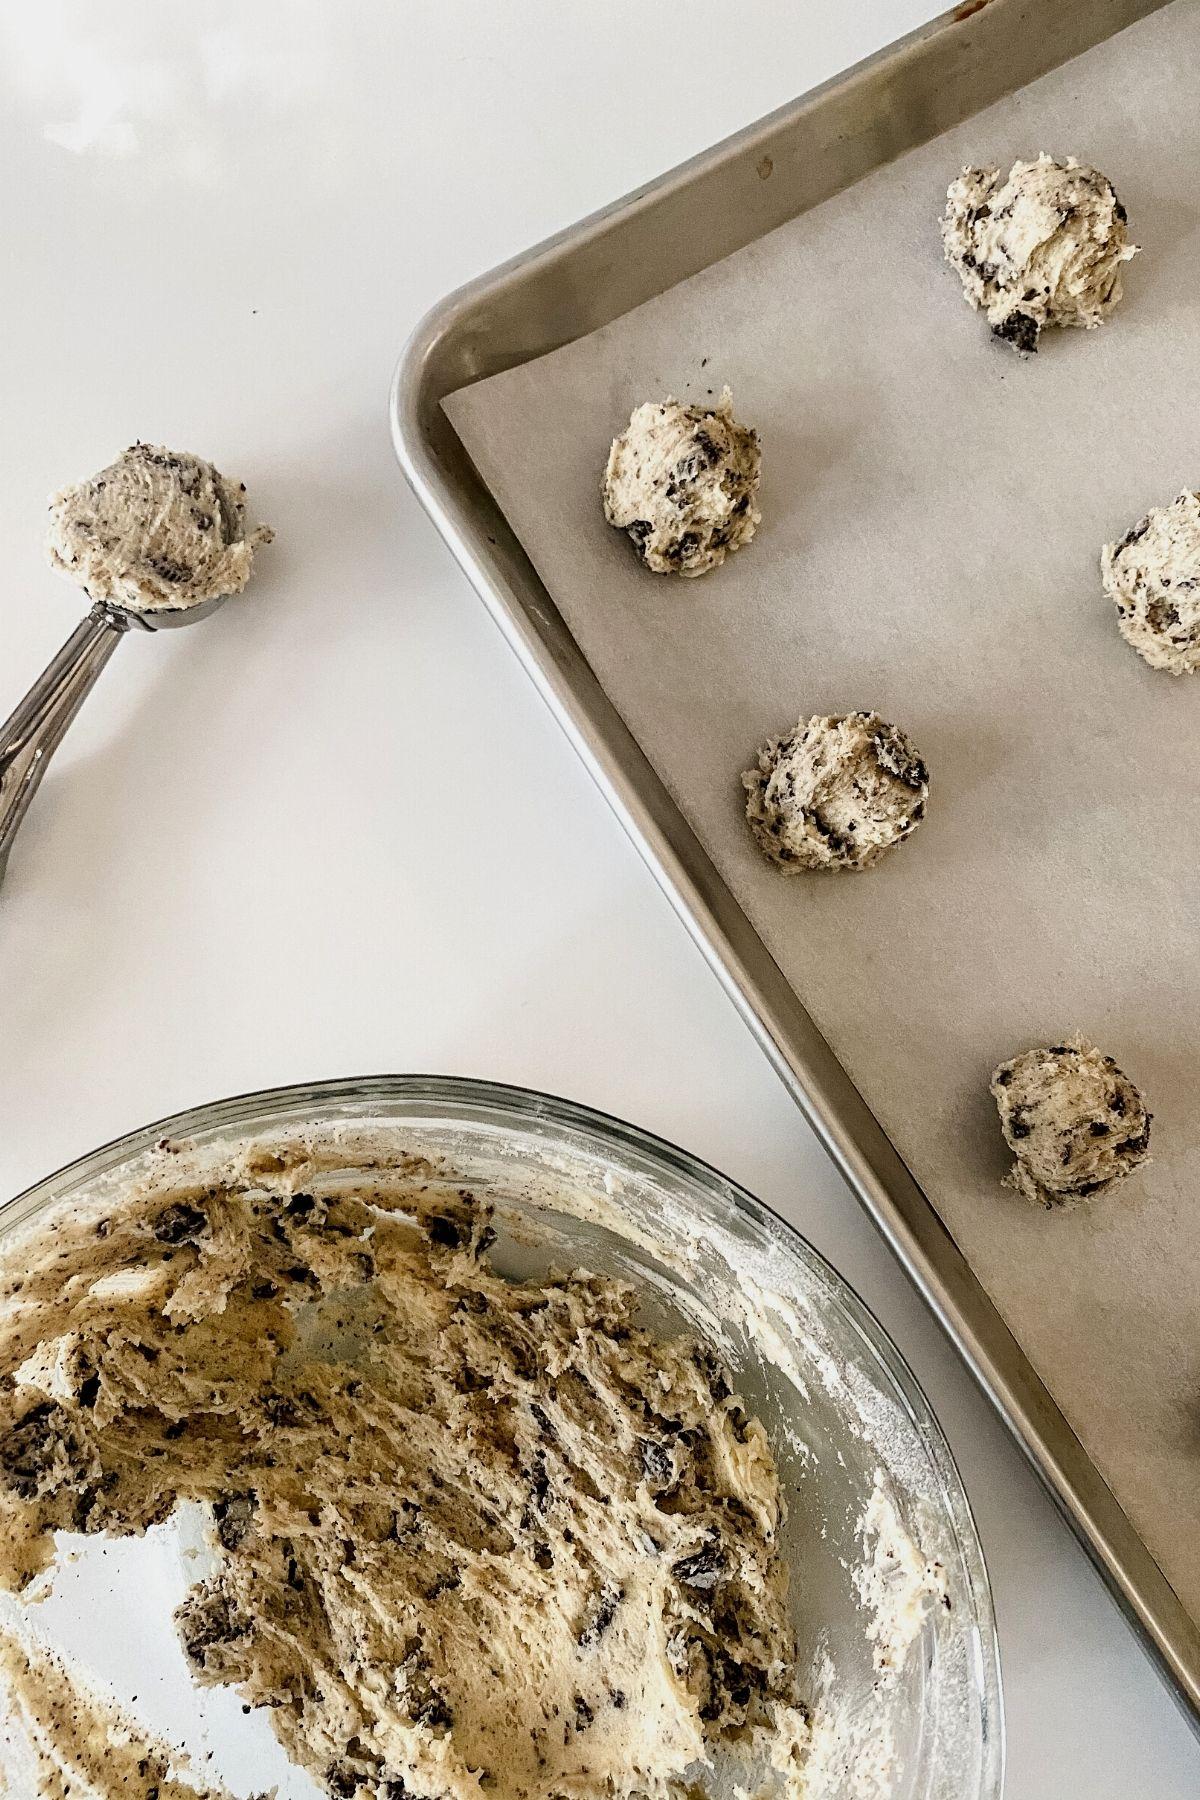 Cookie scoop full of cookie dough